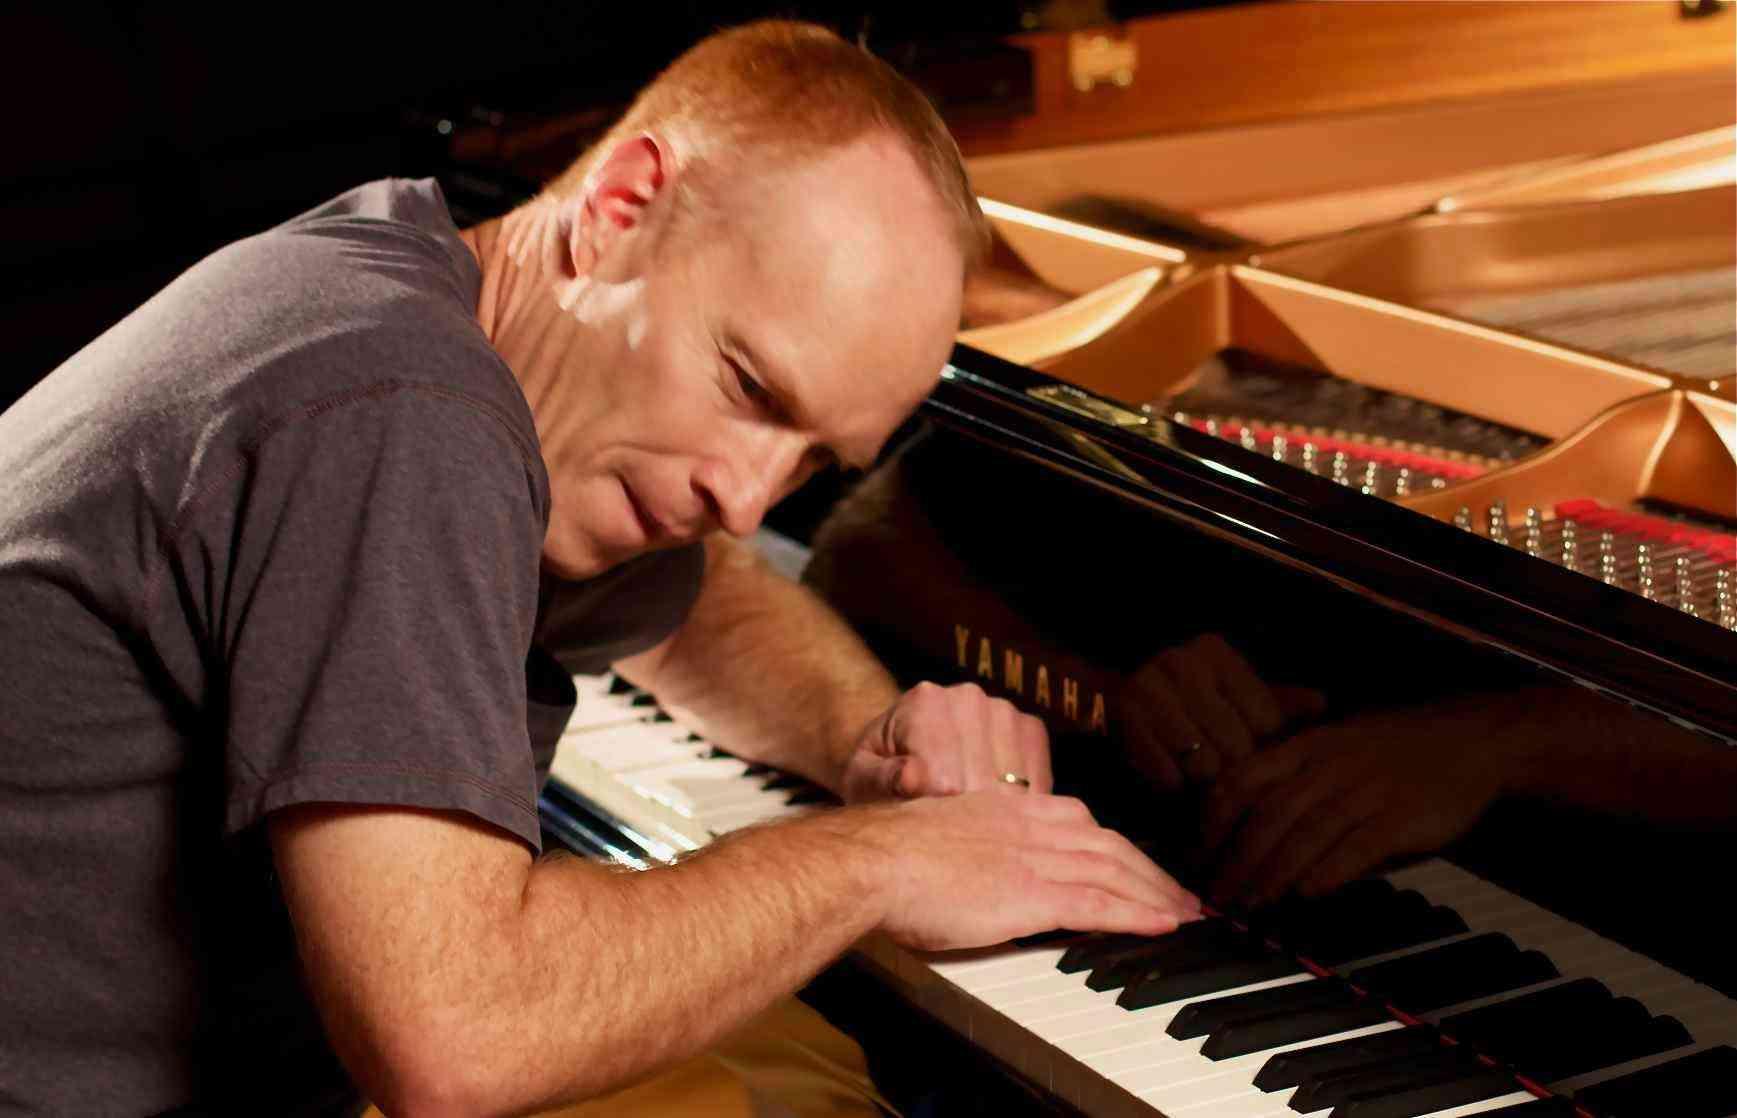 All of Me (Jon Schmidt original tune) - The Piano Guys - YouTube